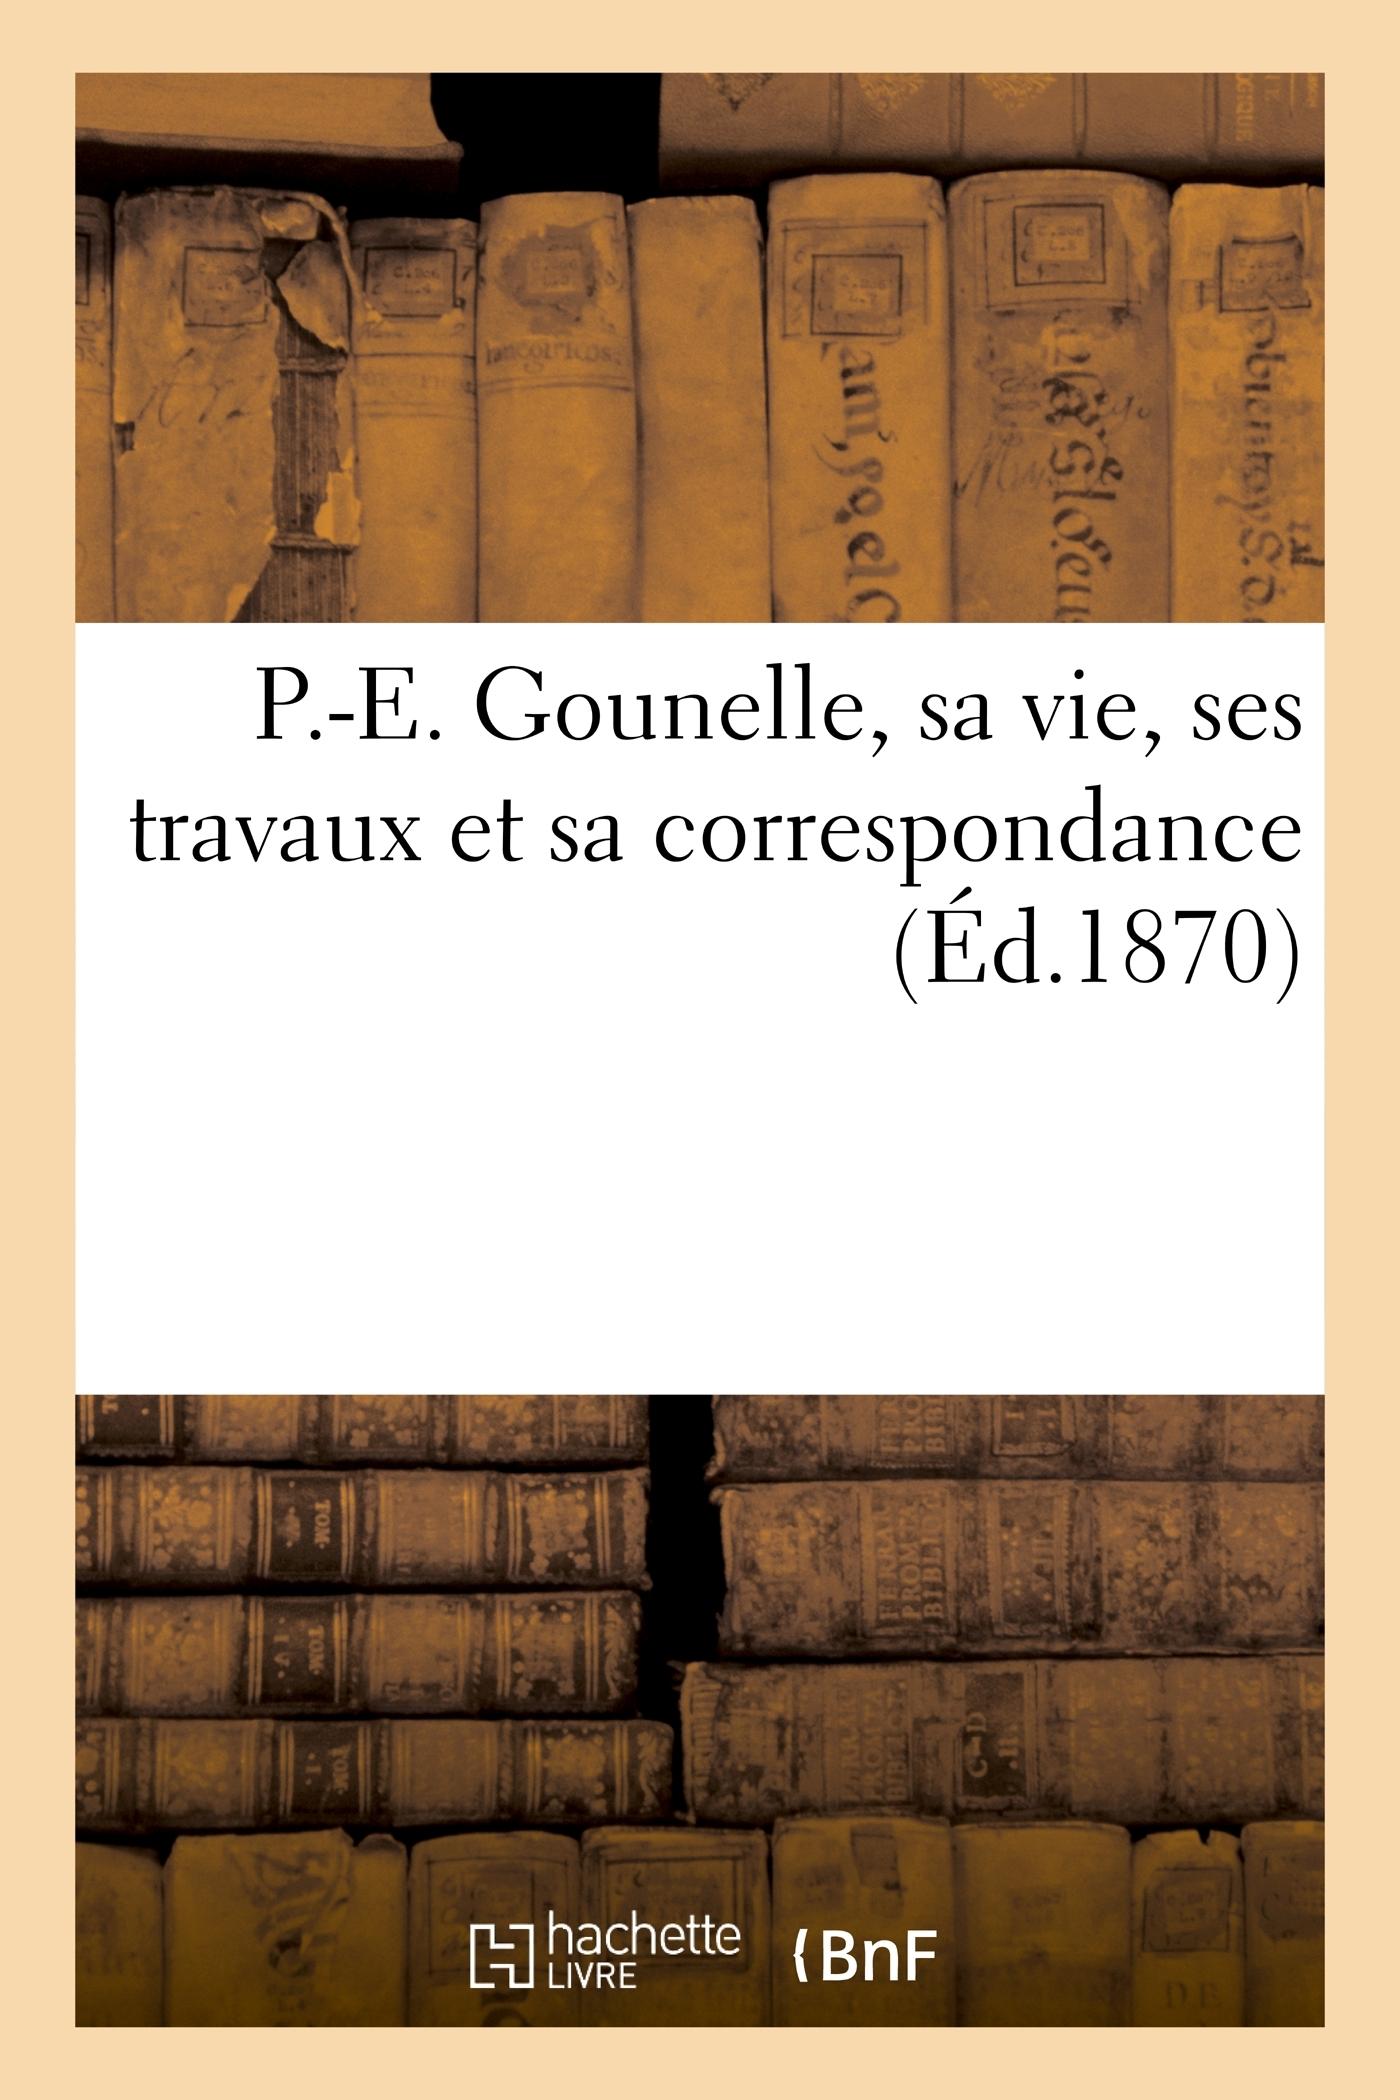 P.-E. GOUNELLE, SA VIE, SES TRAVAUX ET SA CORRESPONDANCE